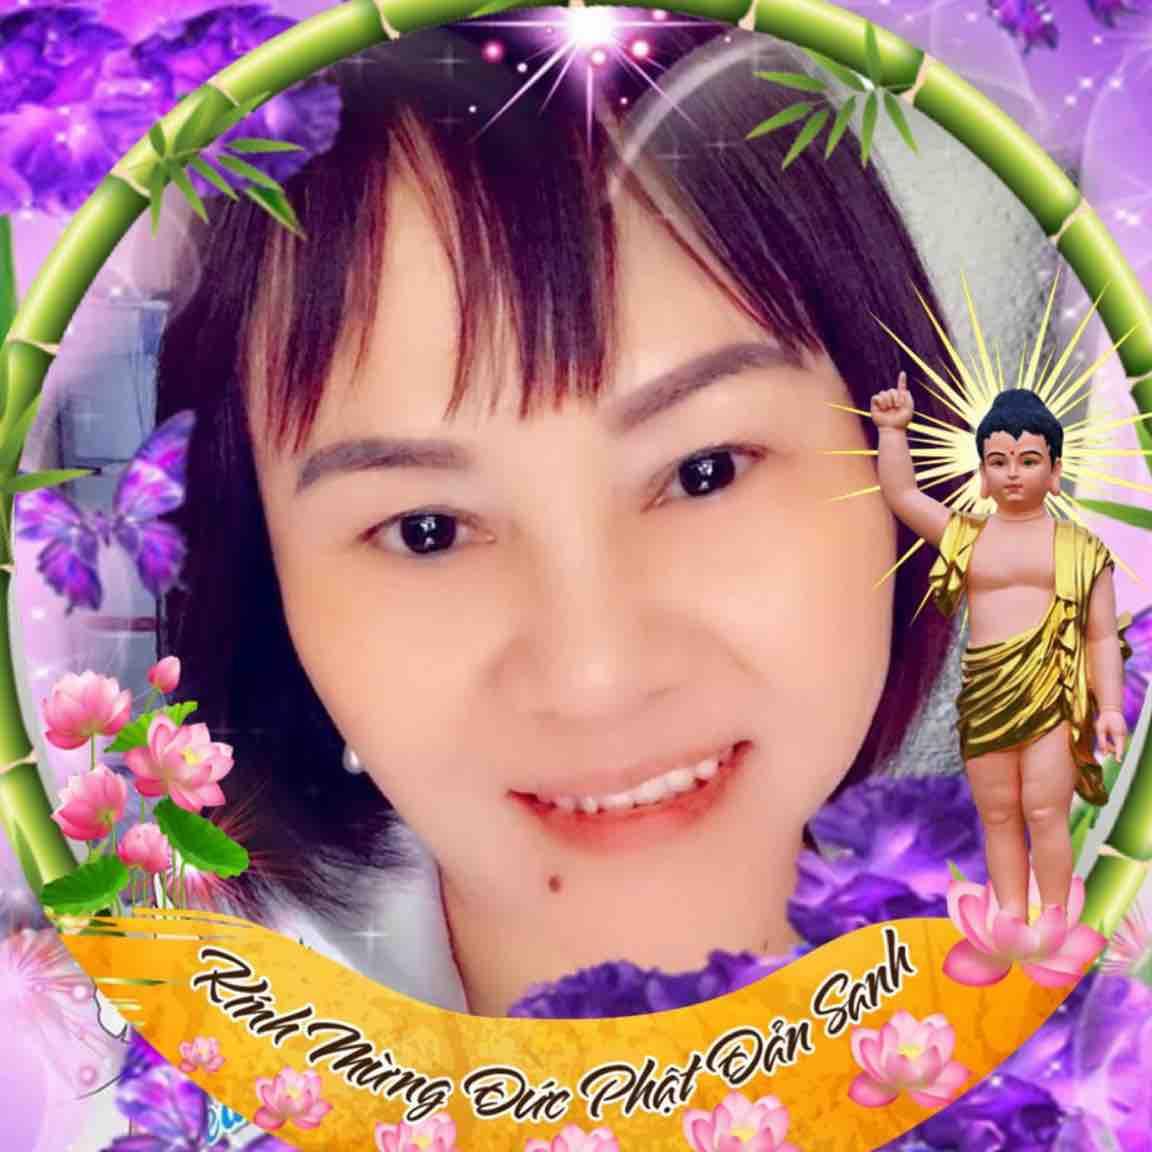 Mai Linh